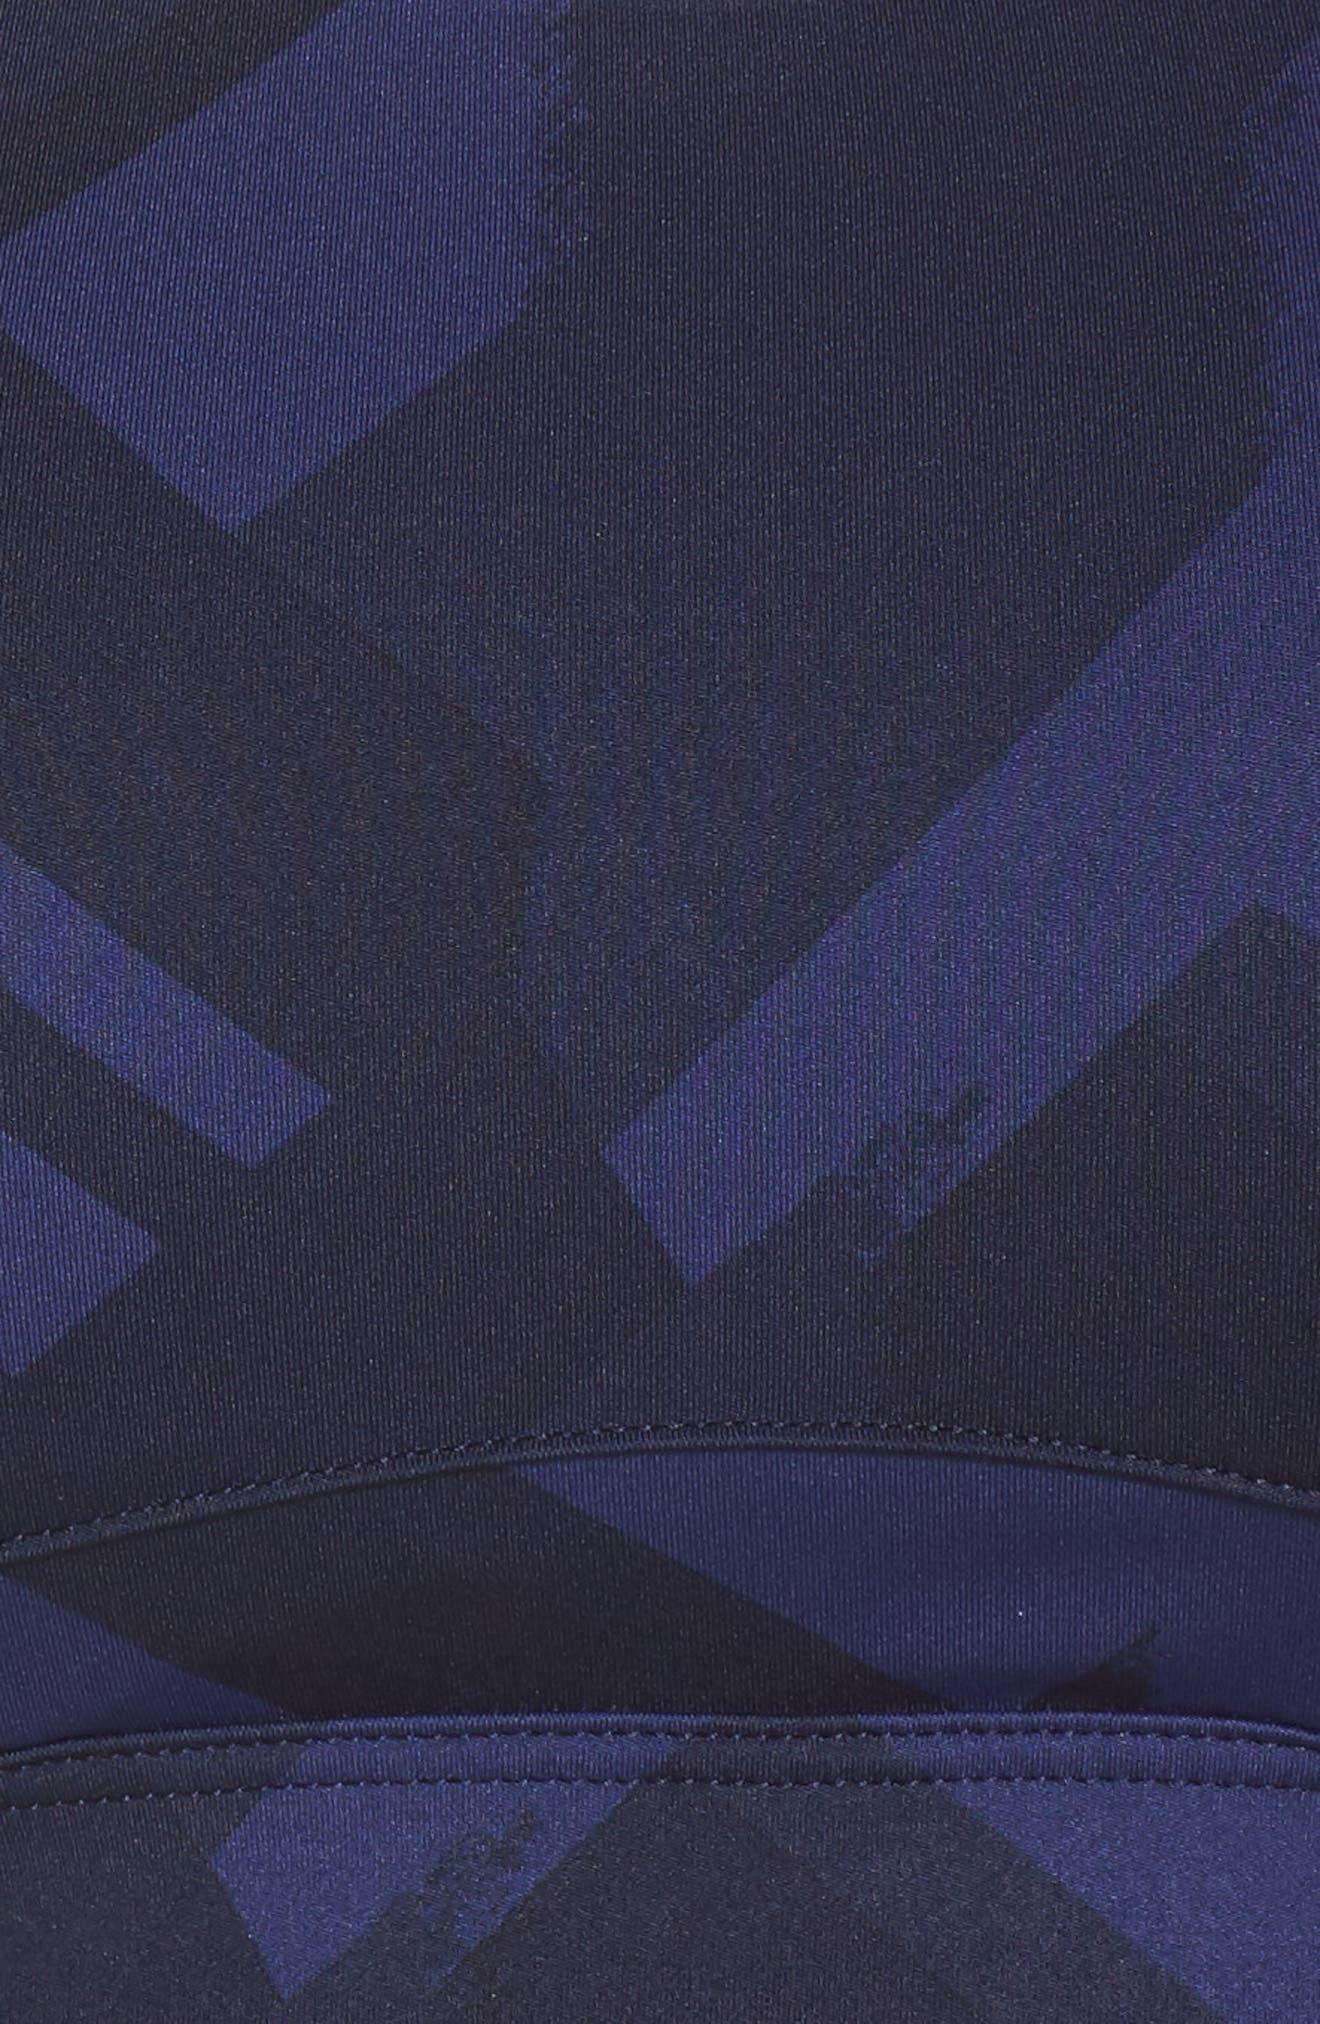 Juno Bra,                             Alternate thumbnail 6, color,                             NAVY ECLIPSE/ NAVY